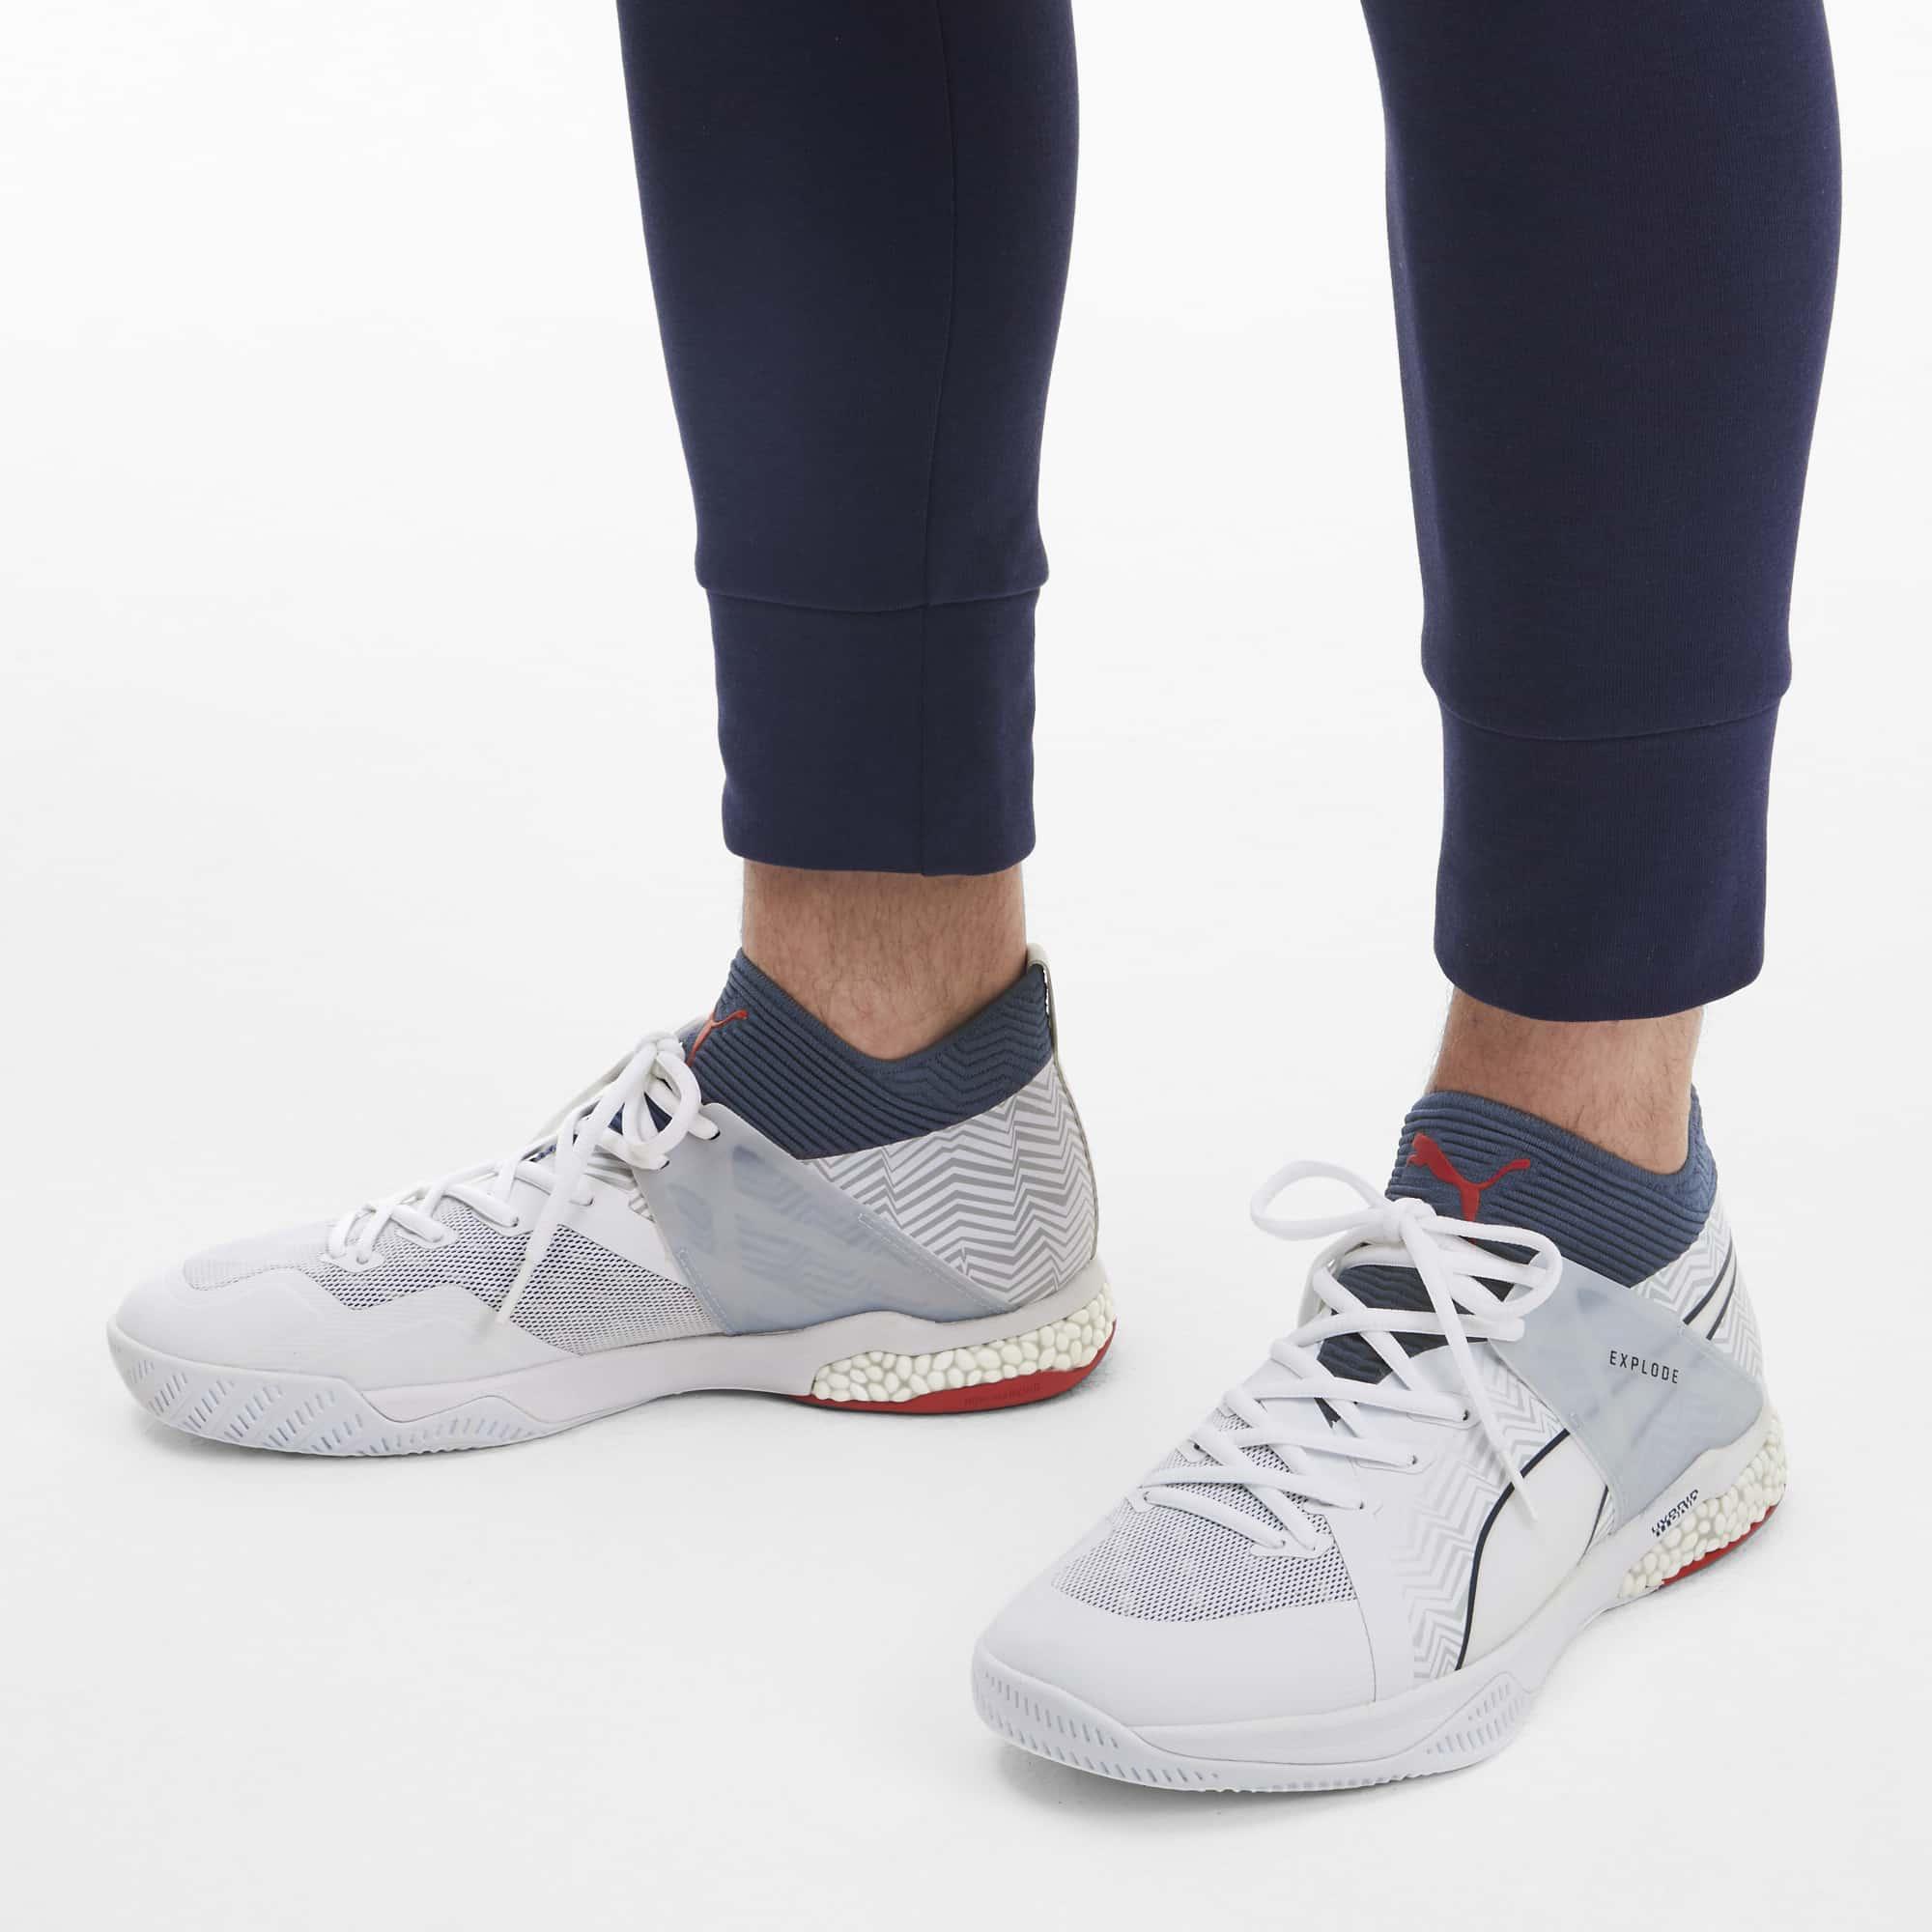 puma-explode-eh-1-chaussures-hand-2020-2